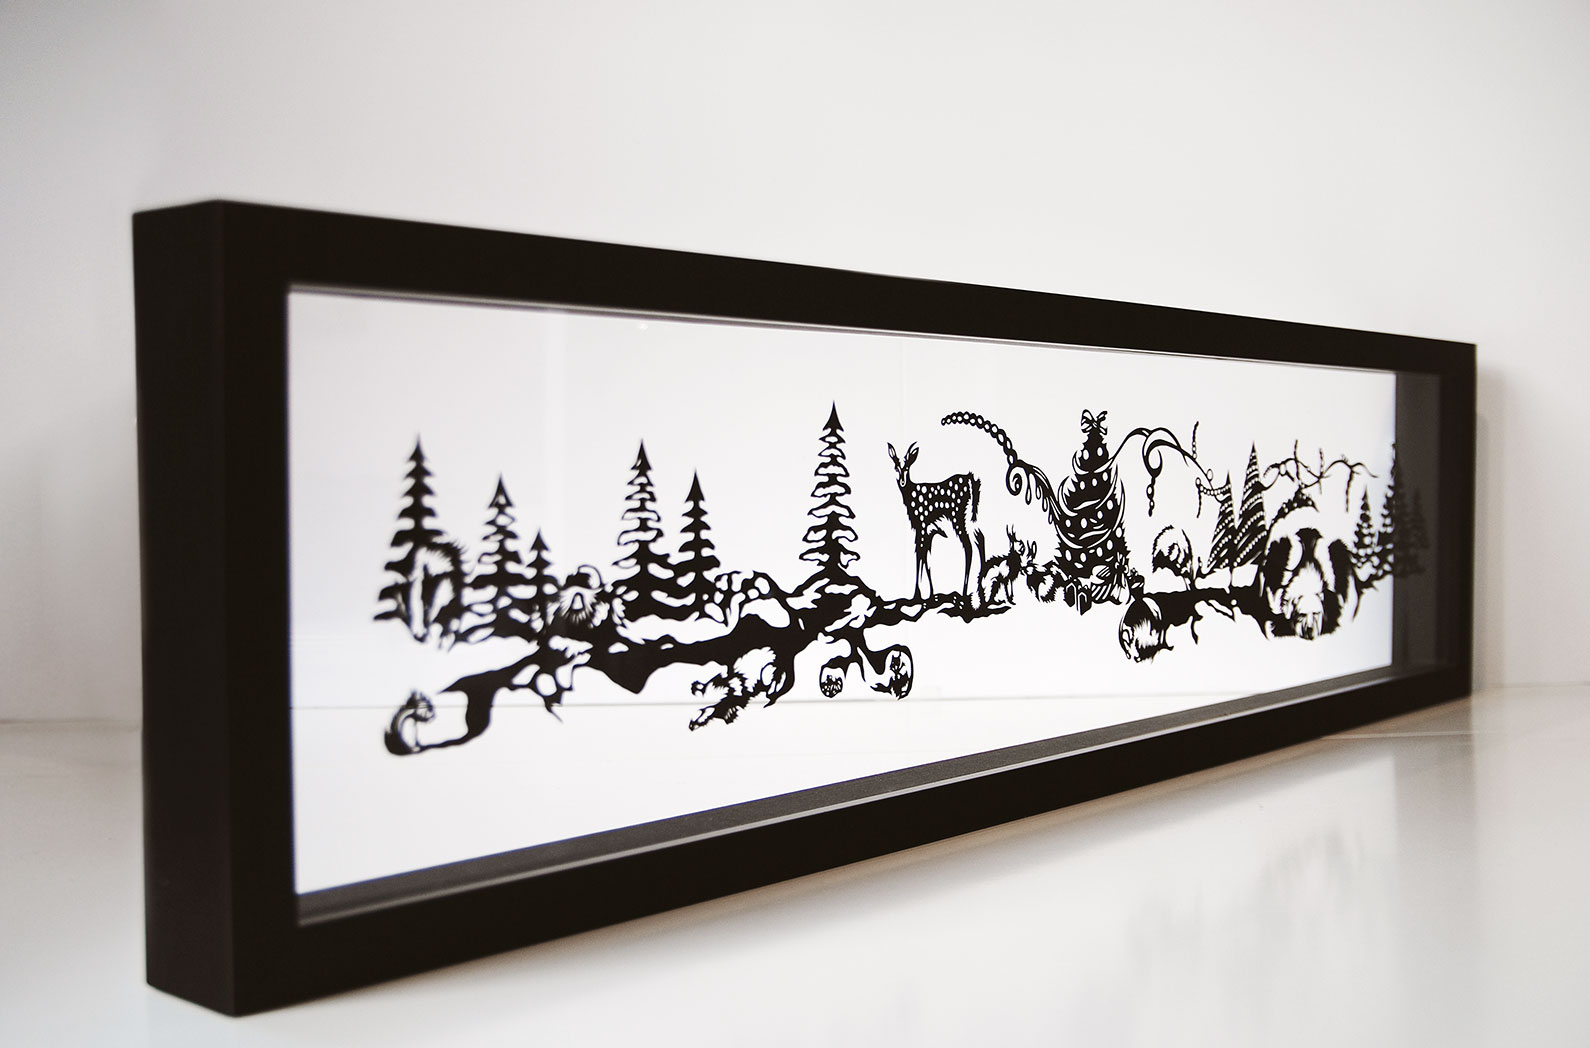 Christmas Art - Japanese Artist - Nahoko Kojima